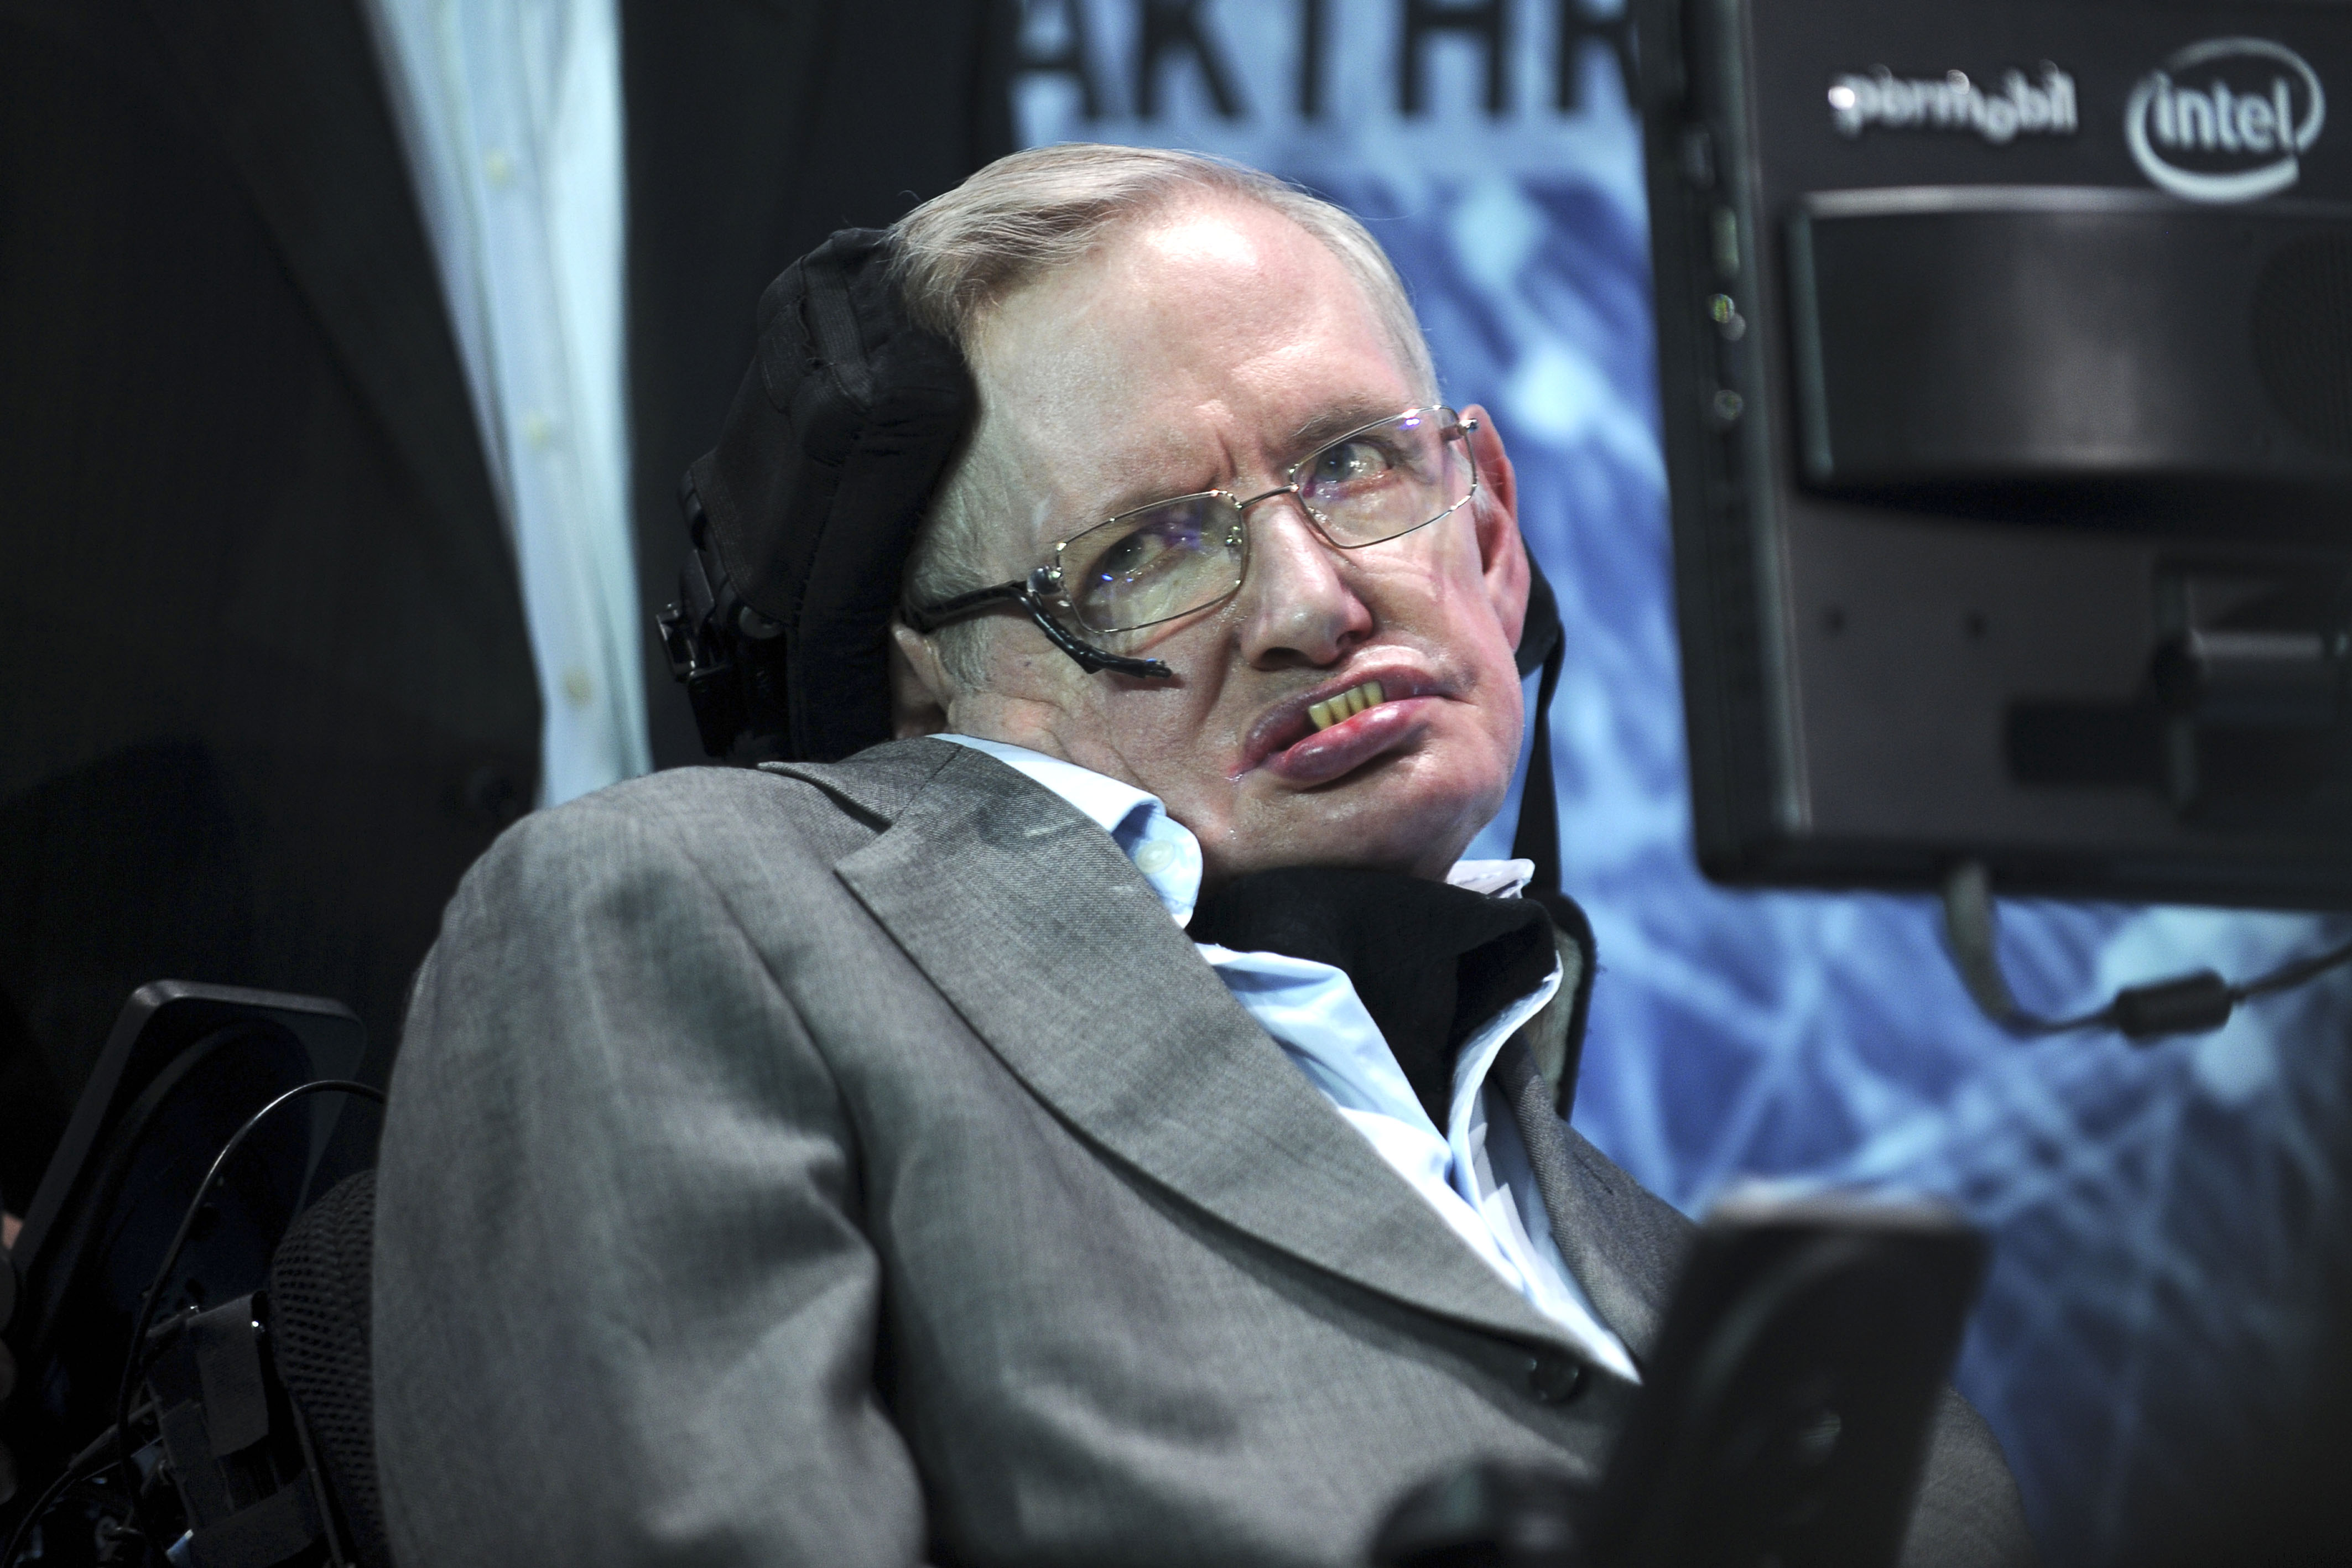 Stephen Hawking announces new 'Breakthrough Starshot' space exploration initiative